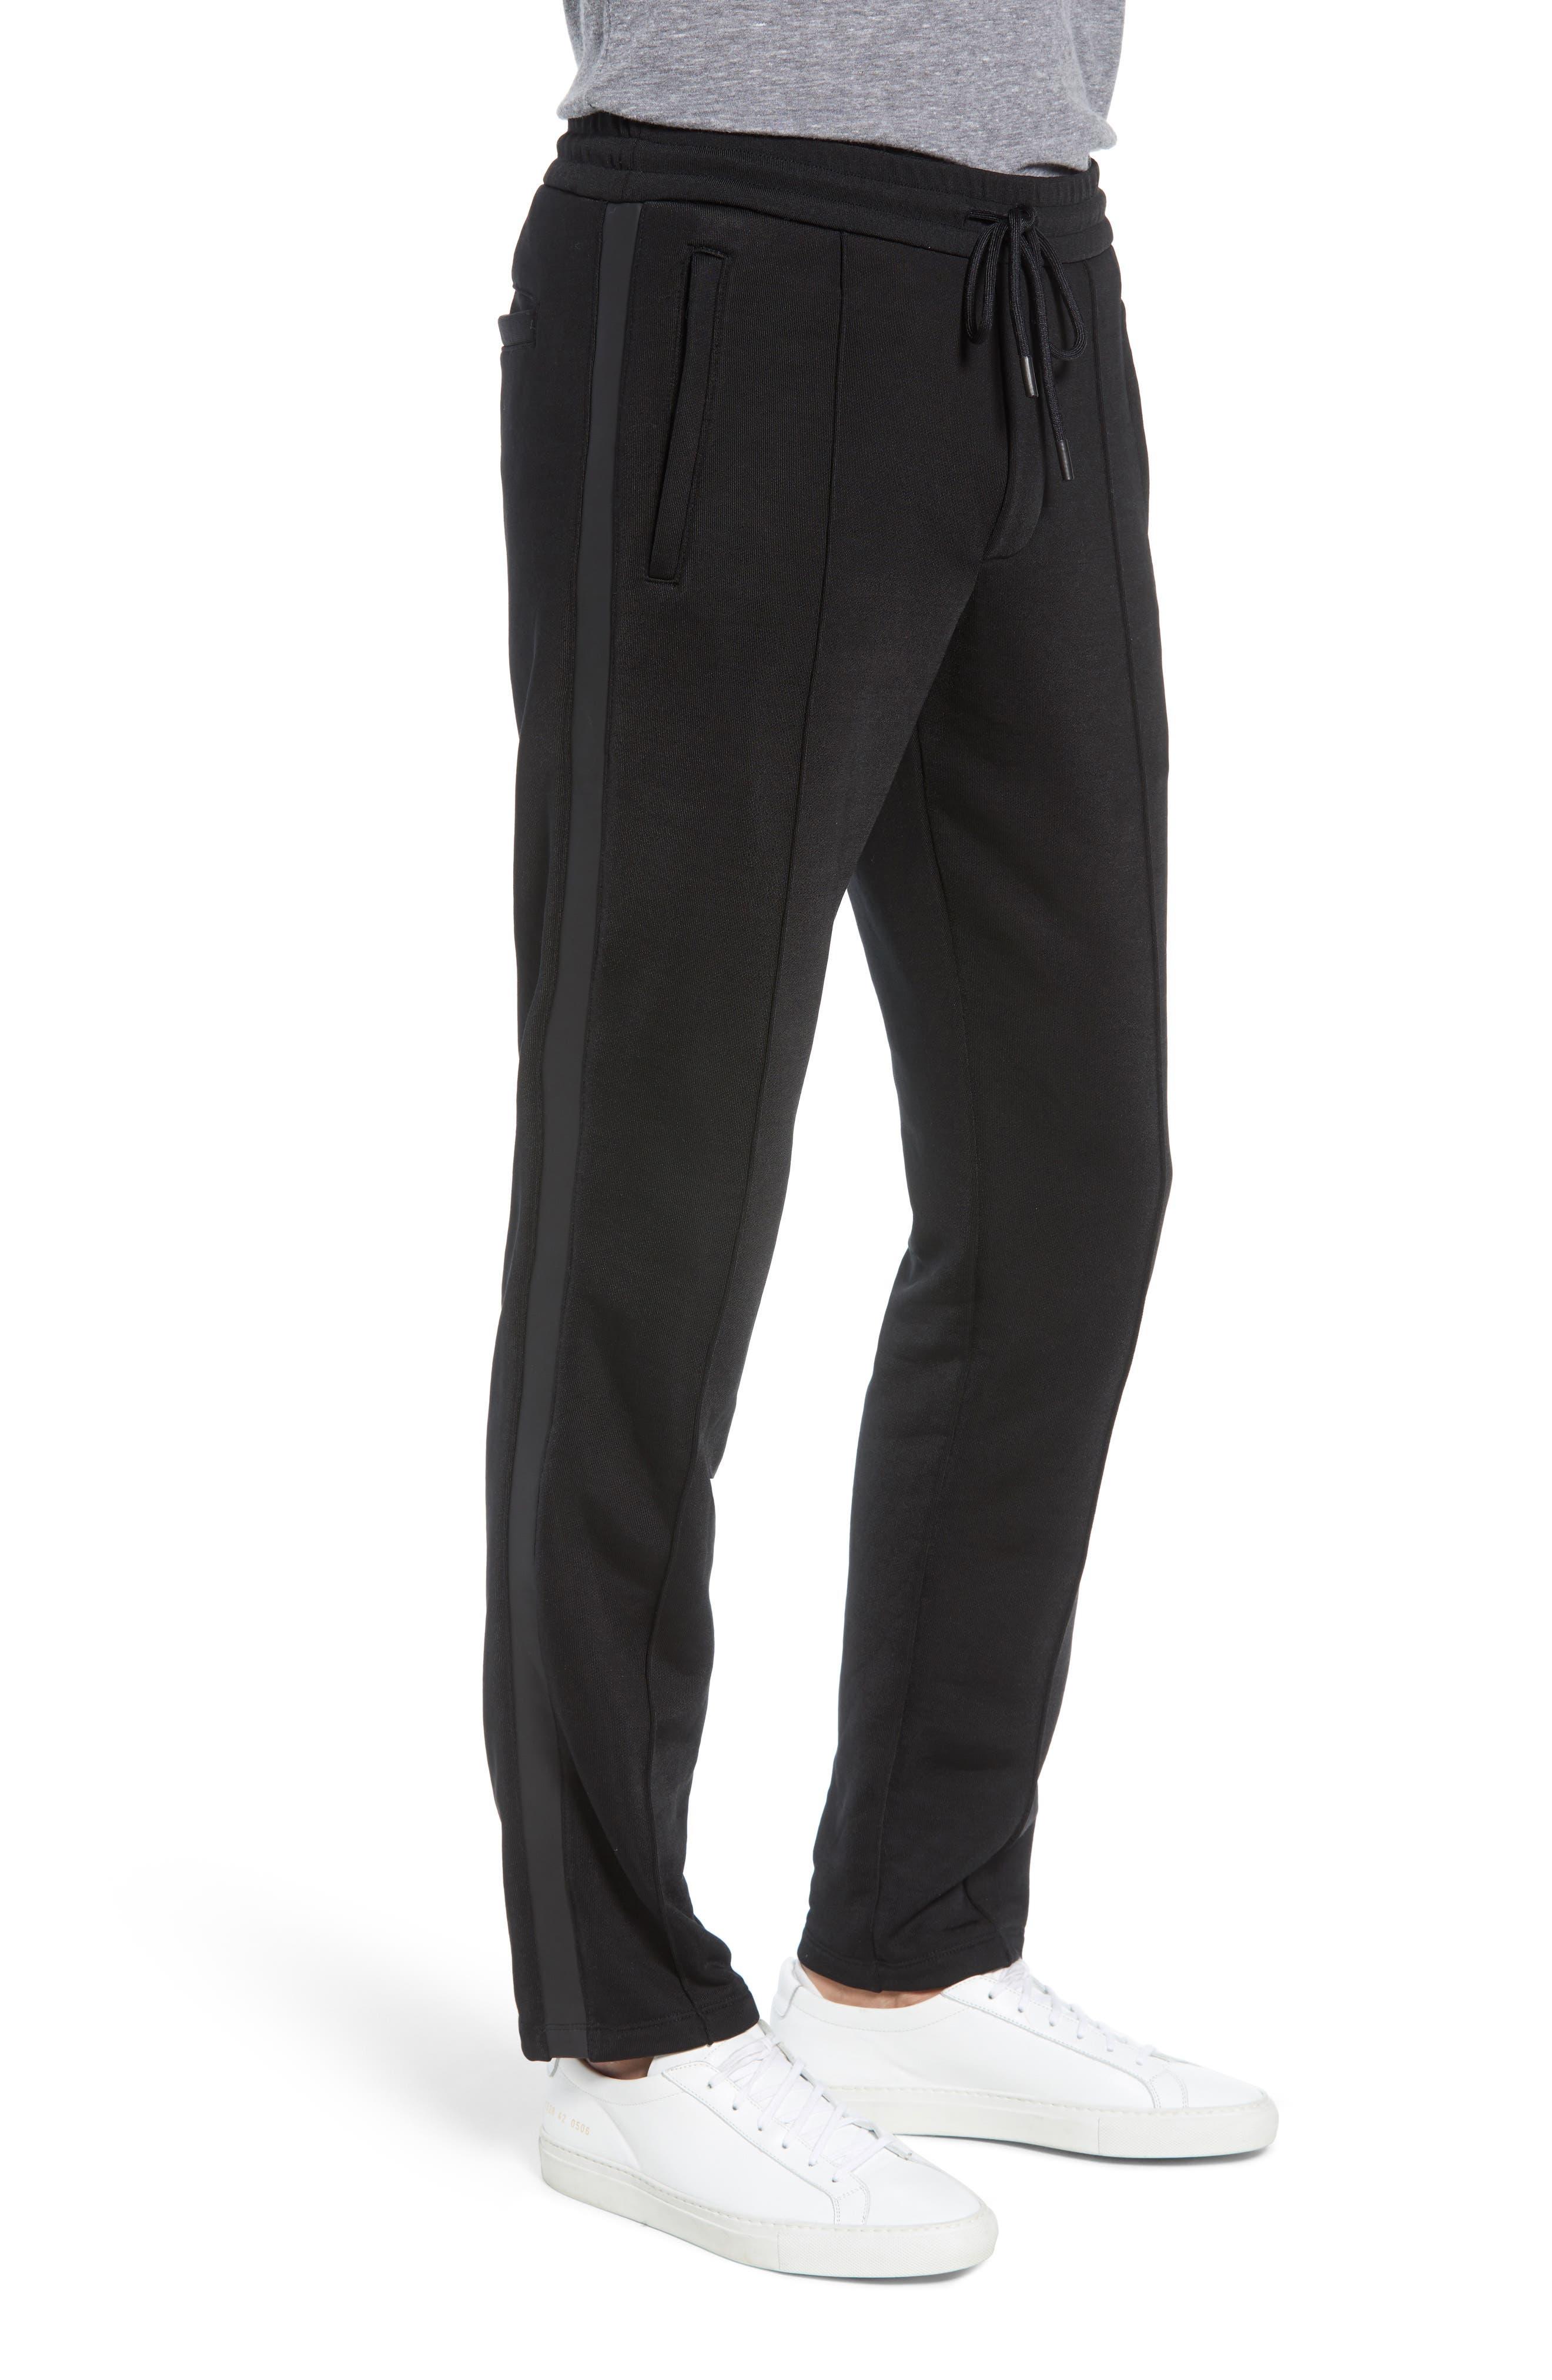 Heat Seal Classic Track Pants,                             Alternate thumbnail 3, color,                             BLACK